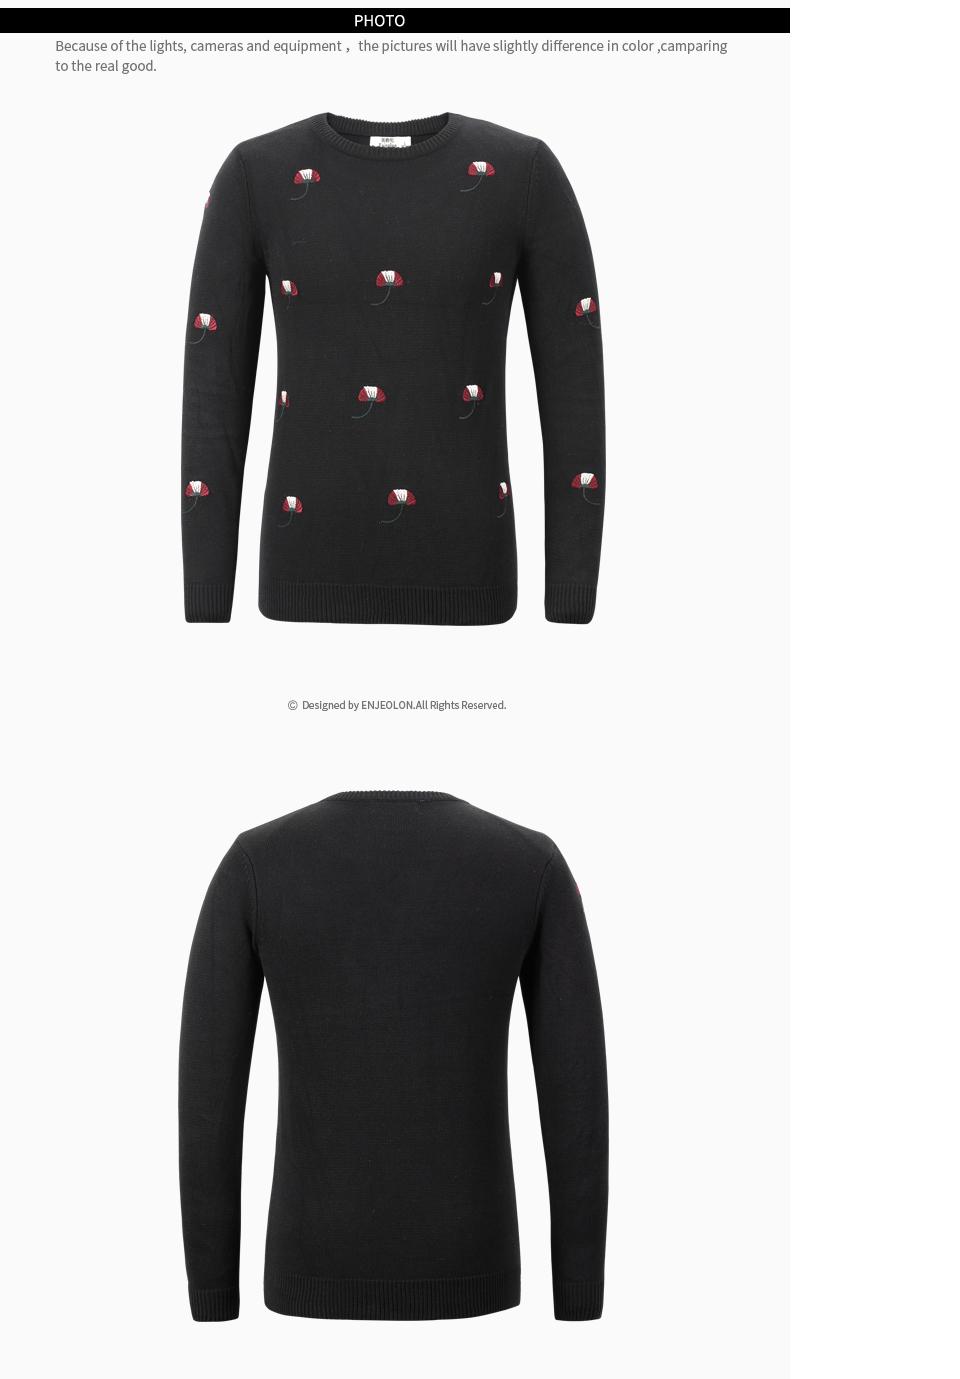 HTB1DLsHbHwTMeJjSszfq6xbtFXa8 - Enjeolon brand top fall winter warm knitted pullovers Sweater man 100 Cotton pattern pullober o-neck pullover Sweater men MY3227